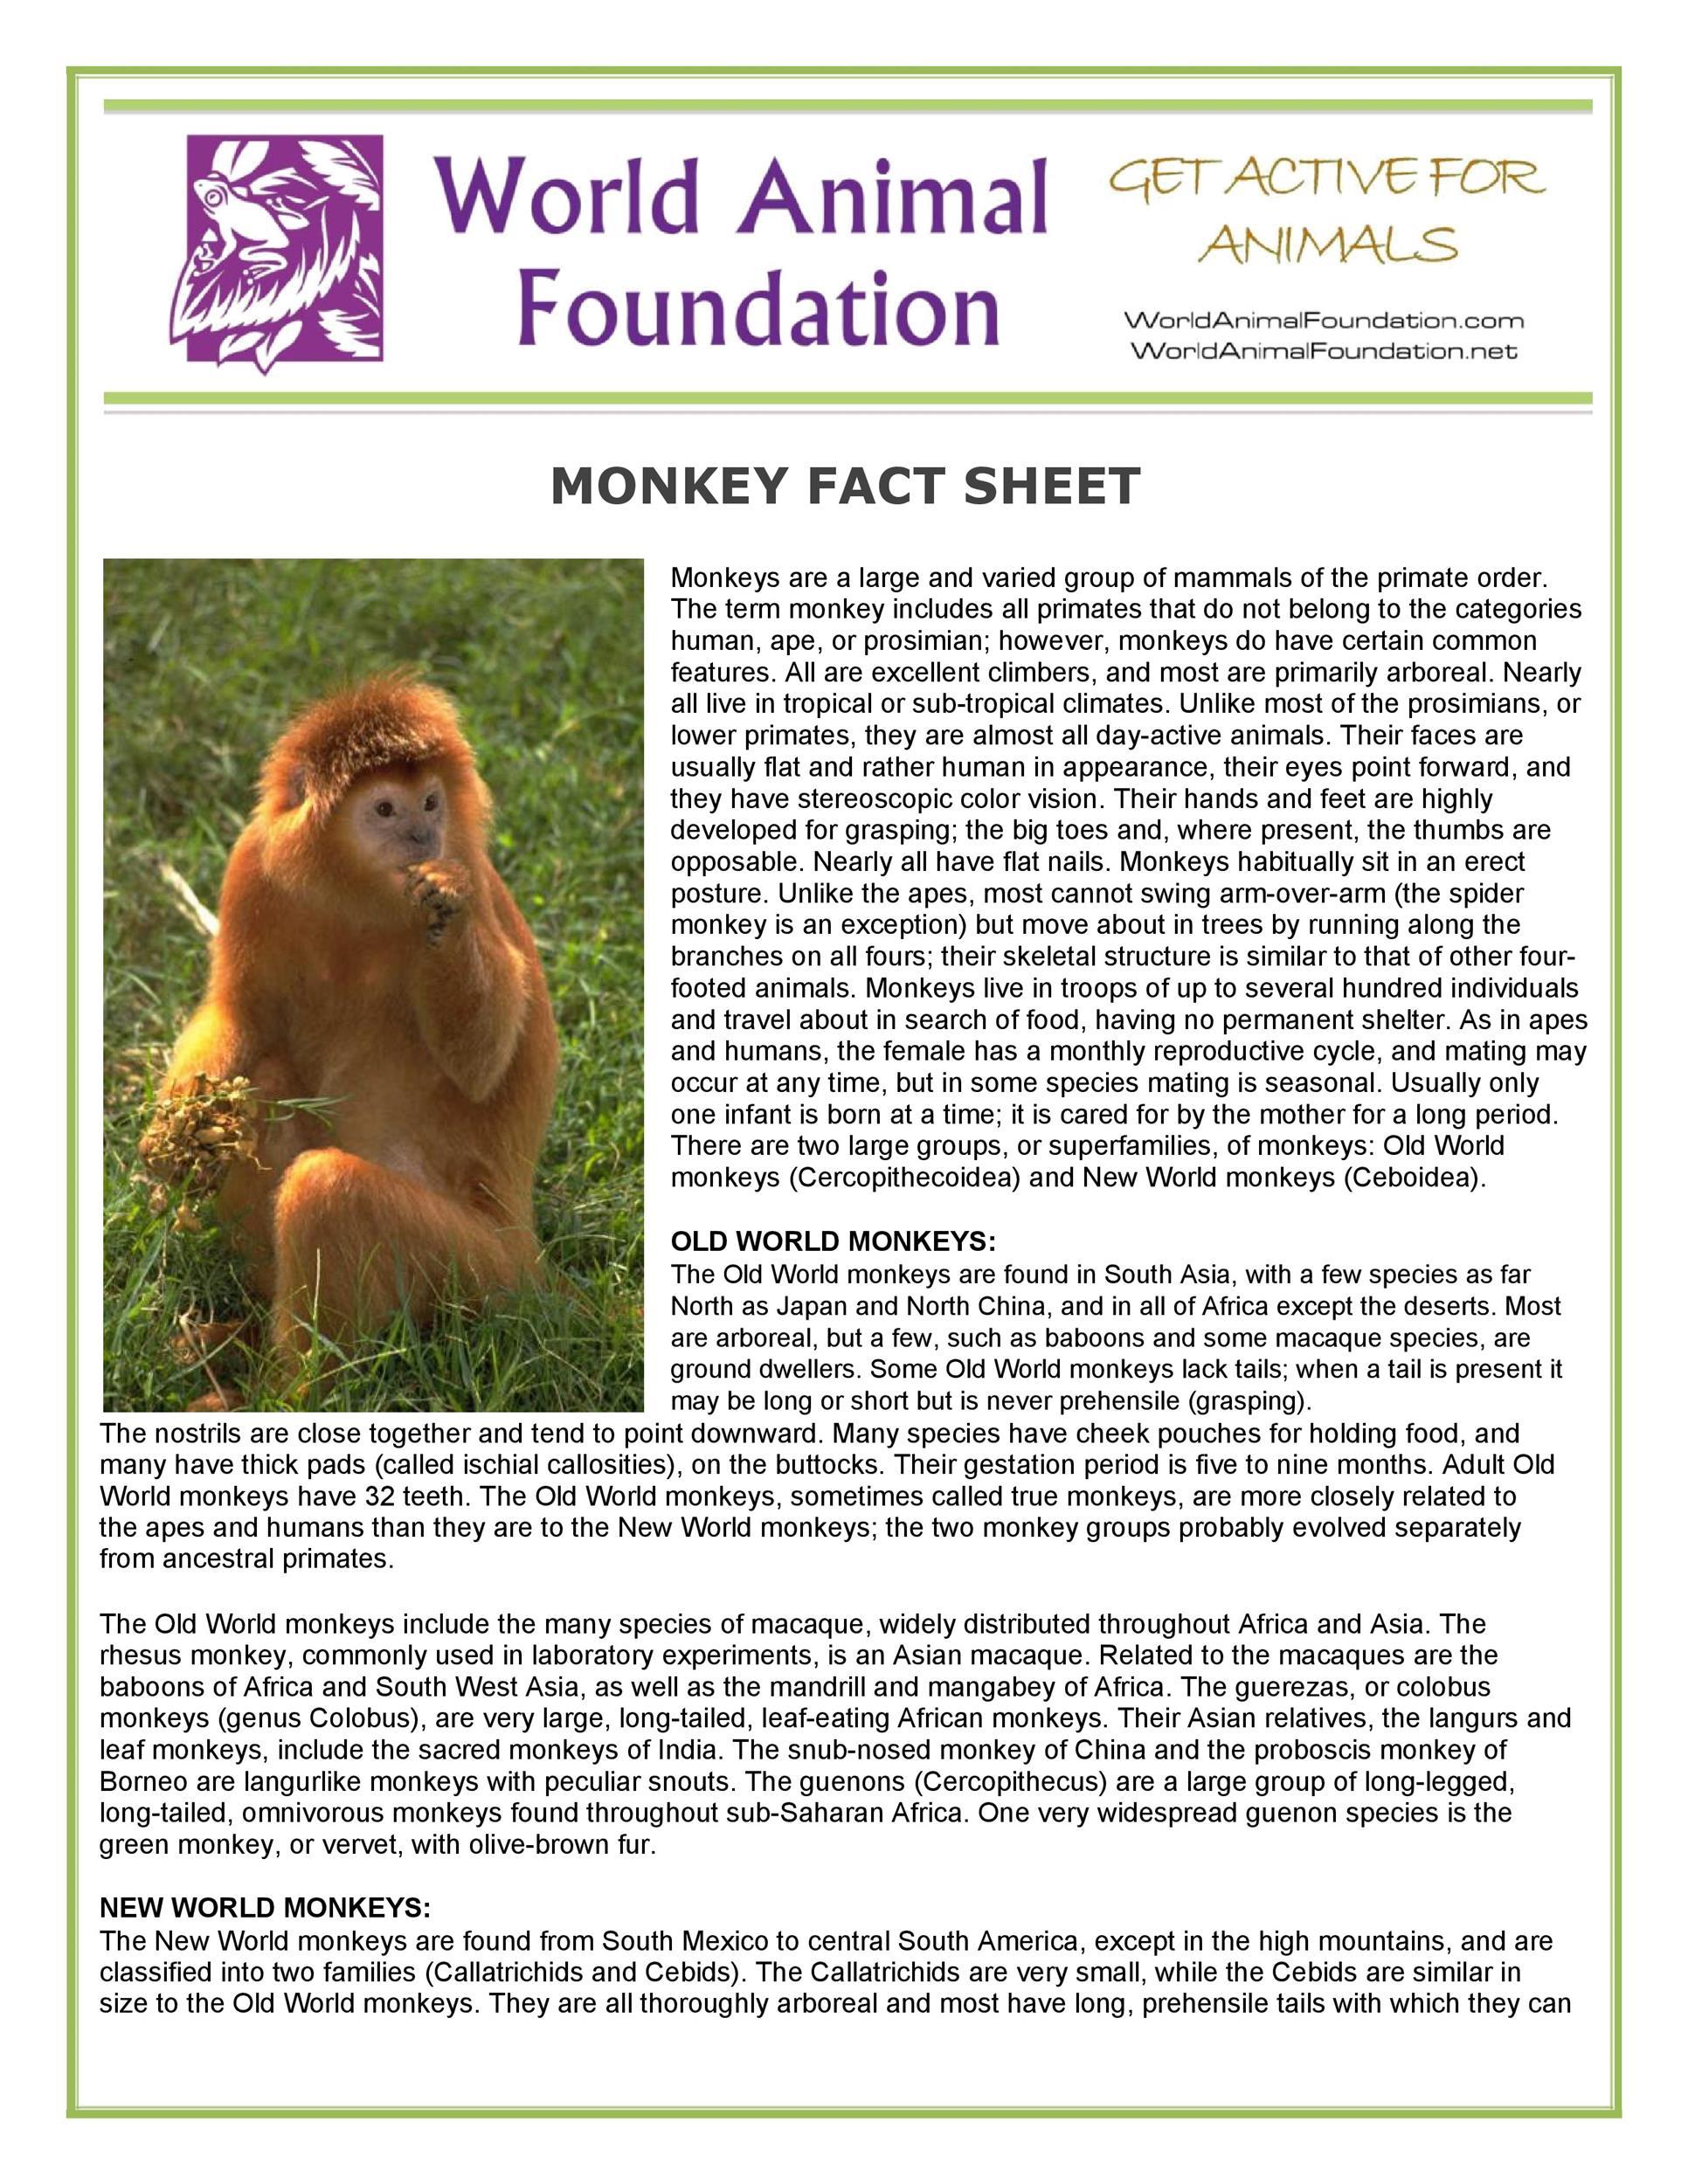 Free Fact sheet Template 20